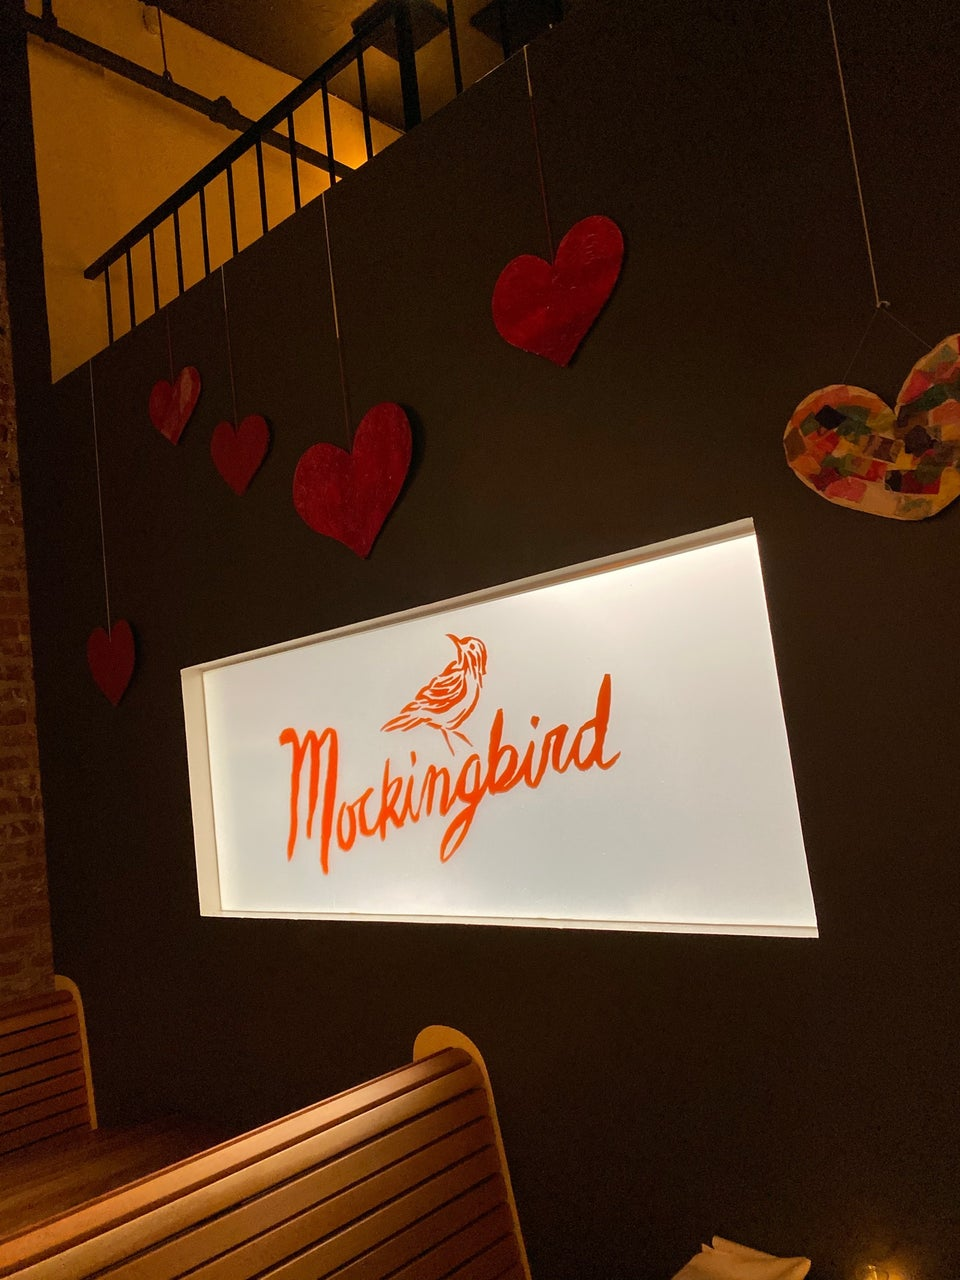 Mockingbird 416 13th St, Oakland